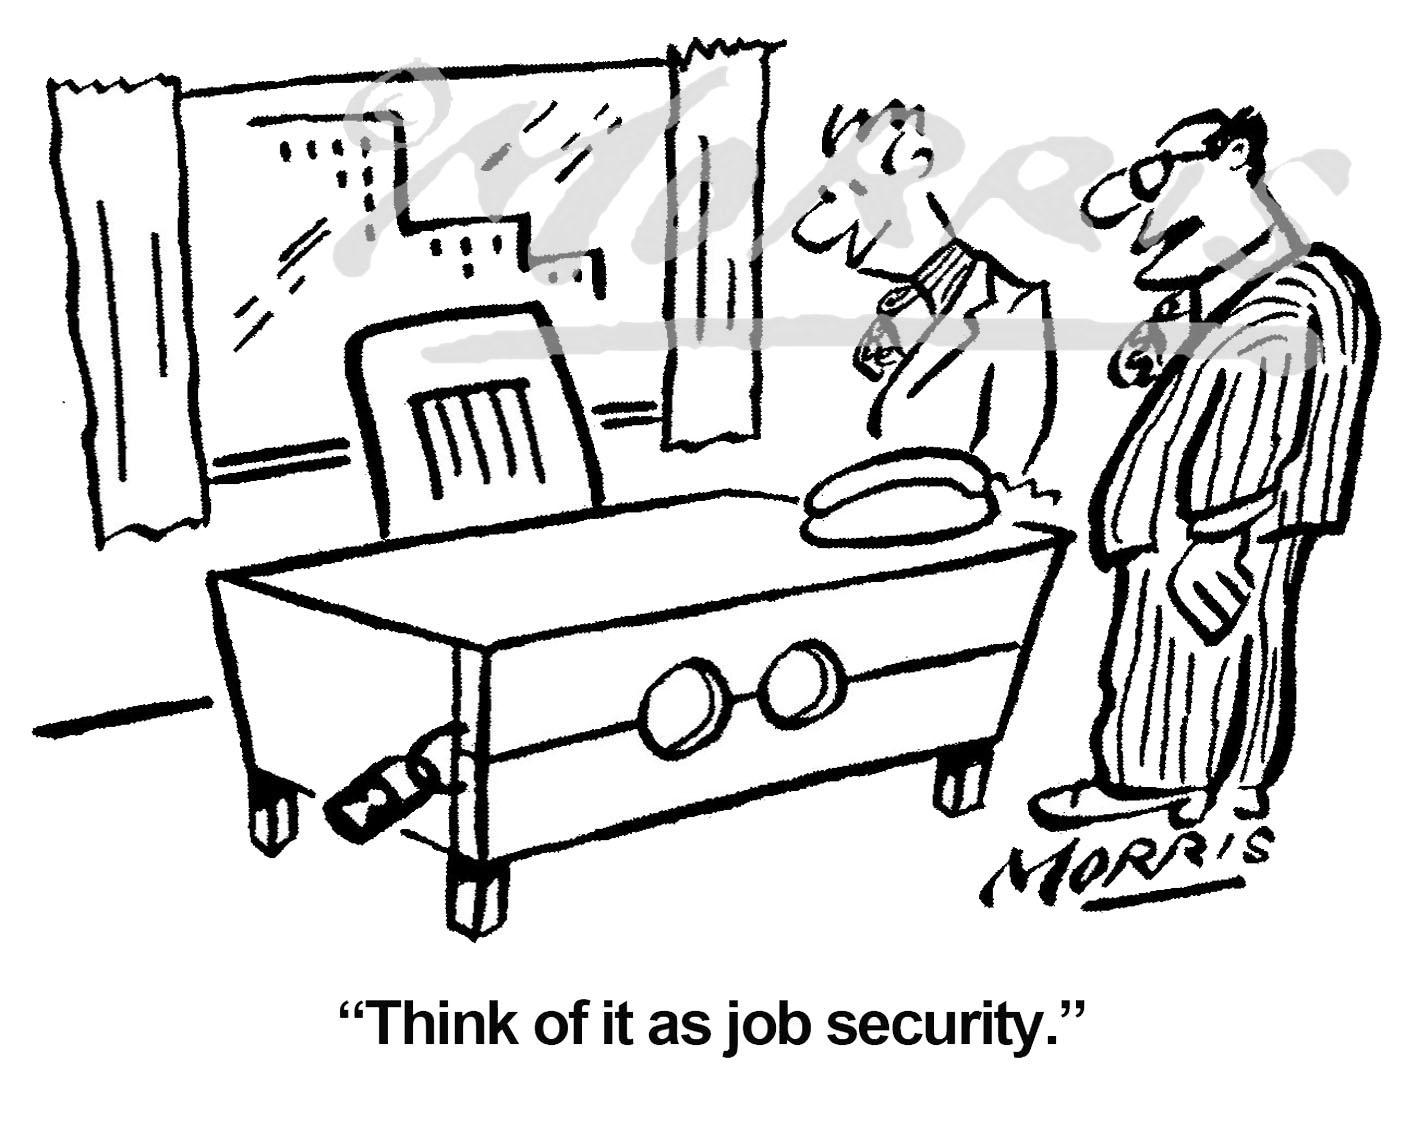 Job security cartoon, office cartoon – Ref: 7381bw